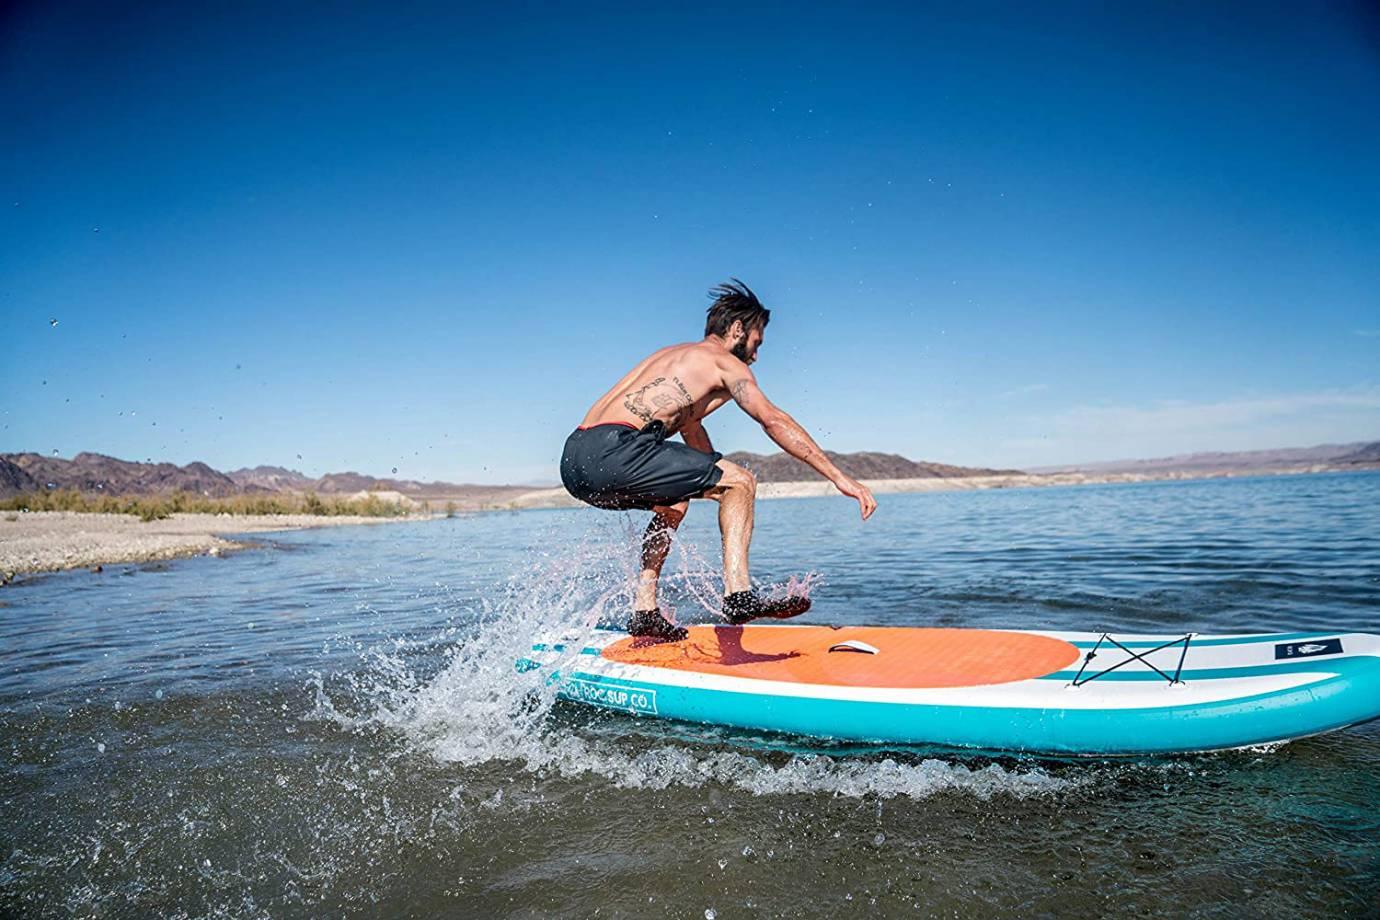 ROC standup paddle board